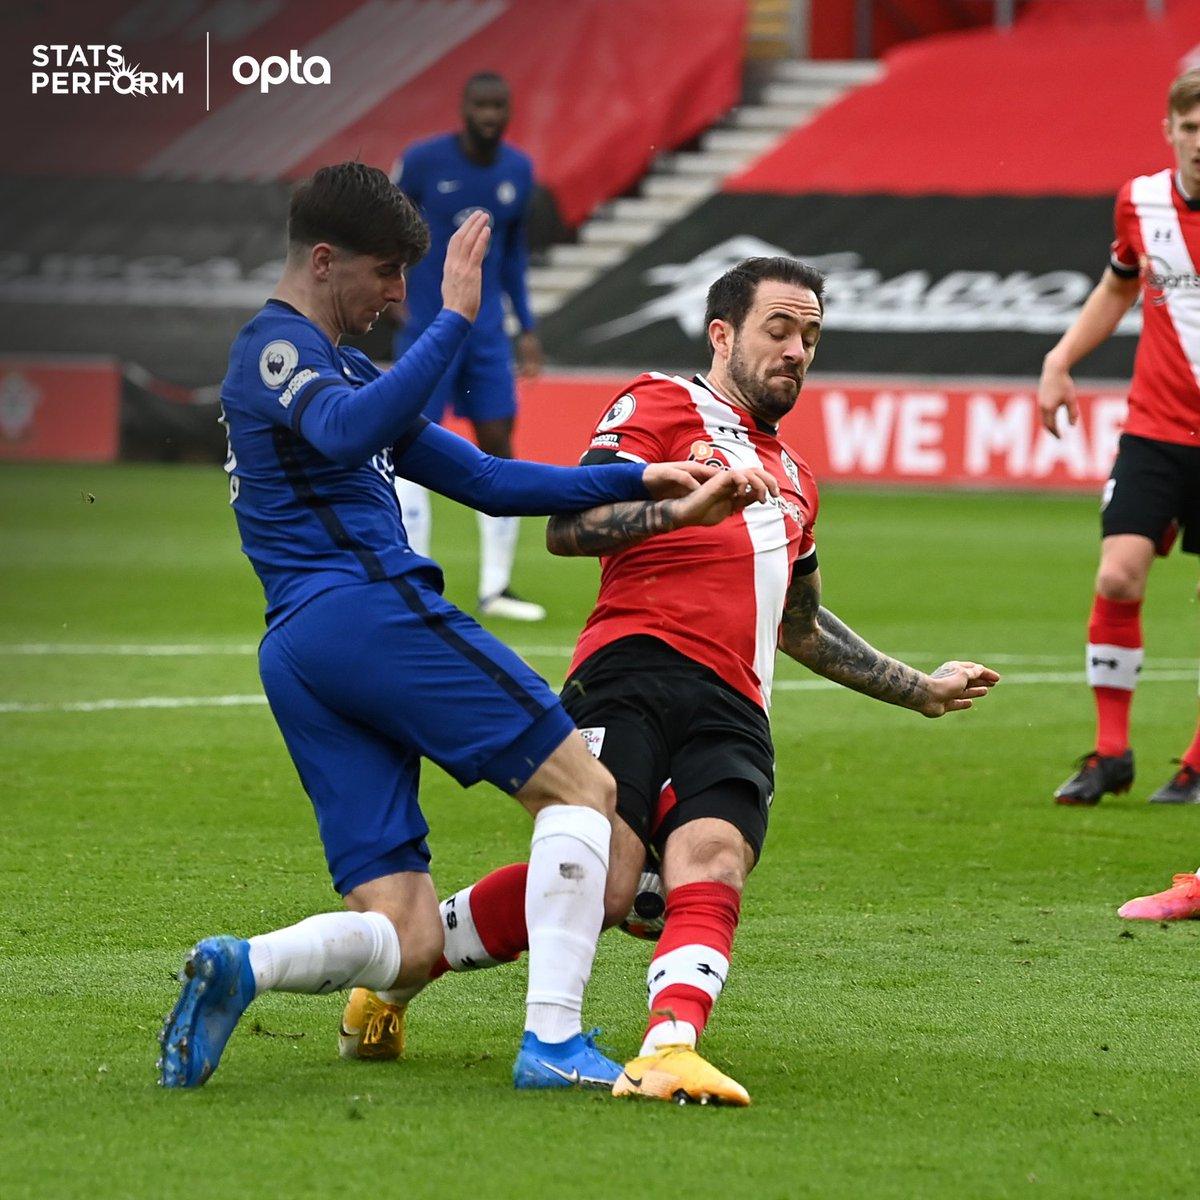 @OptaJoe's photo on Premier League